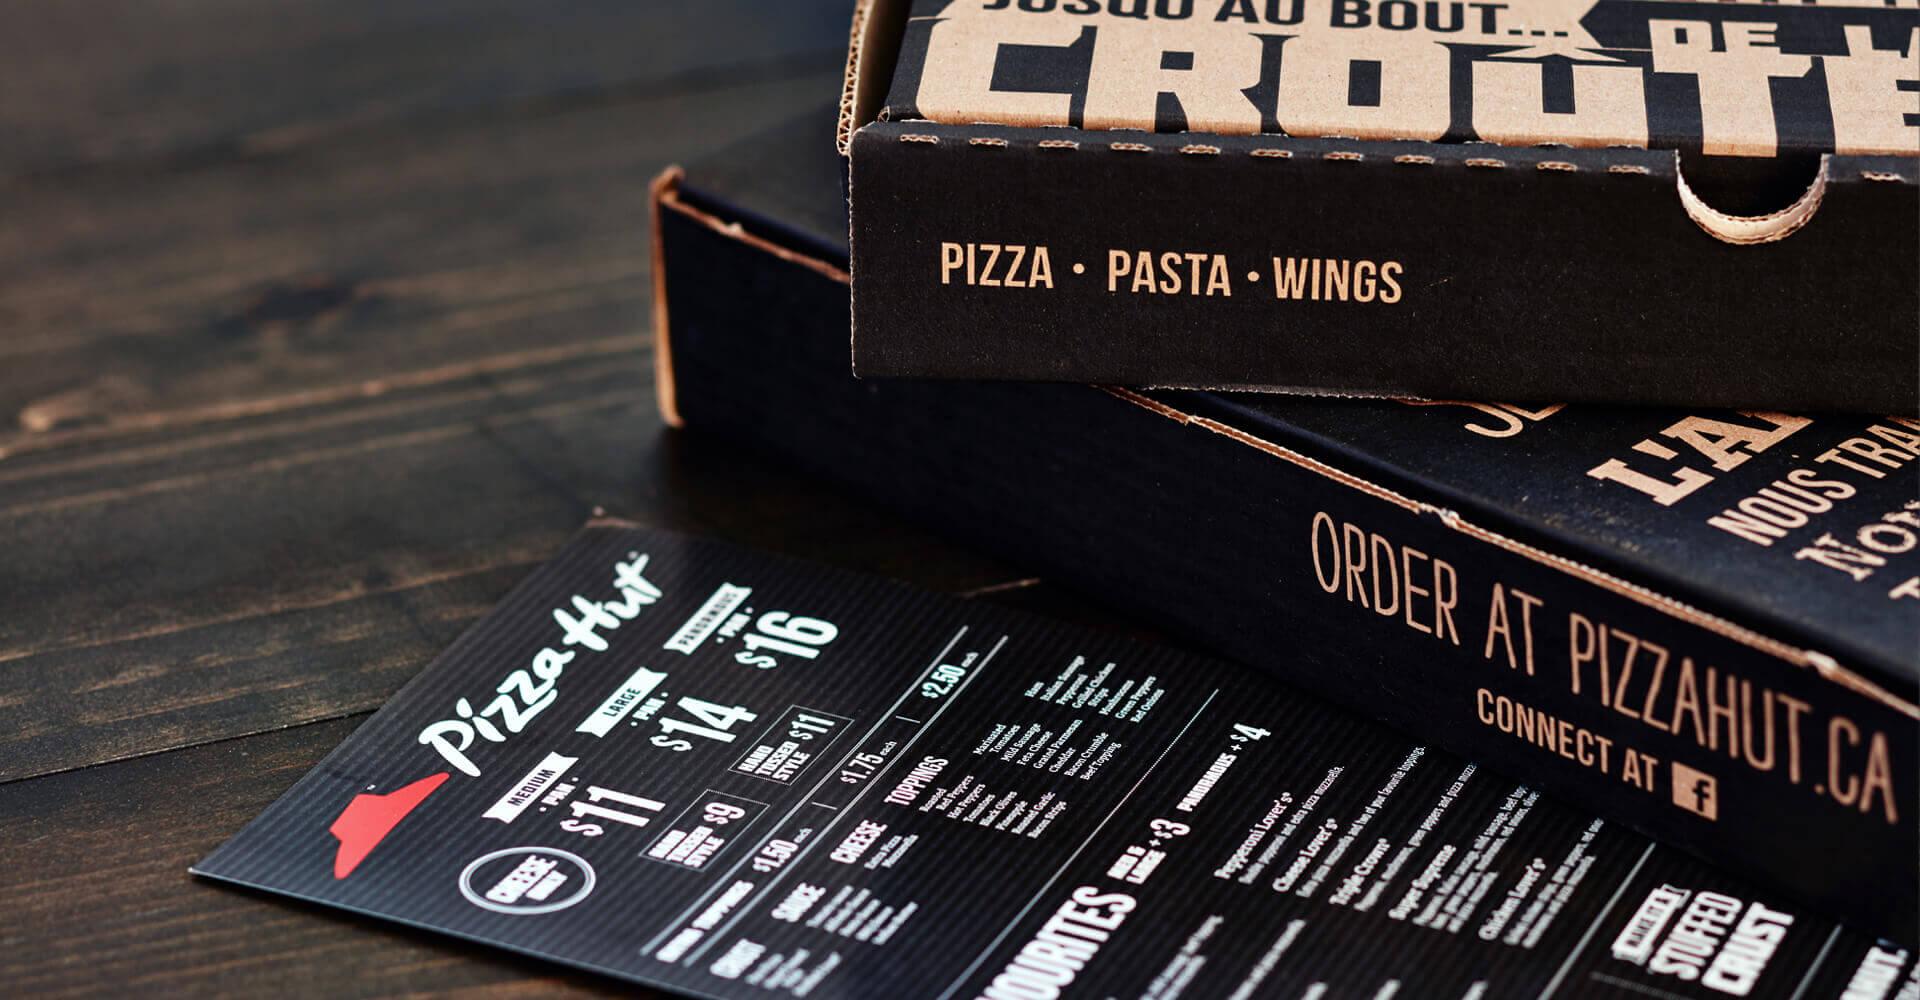 Yum! - Pizza Hut